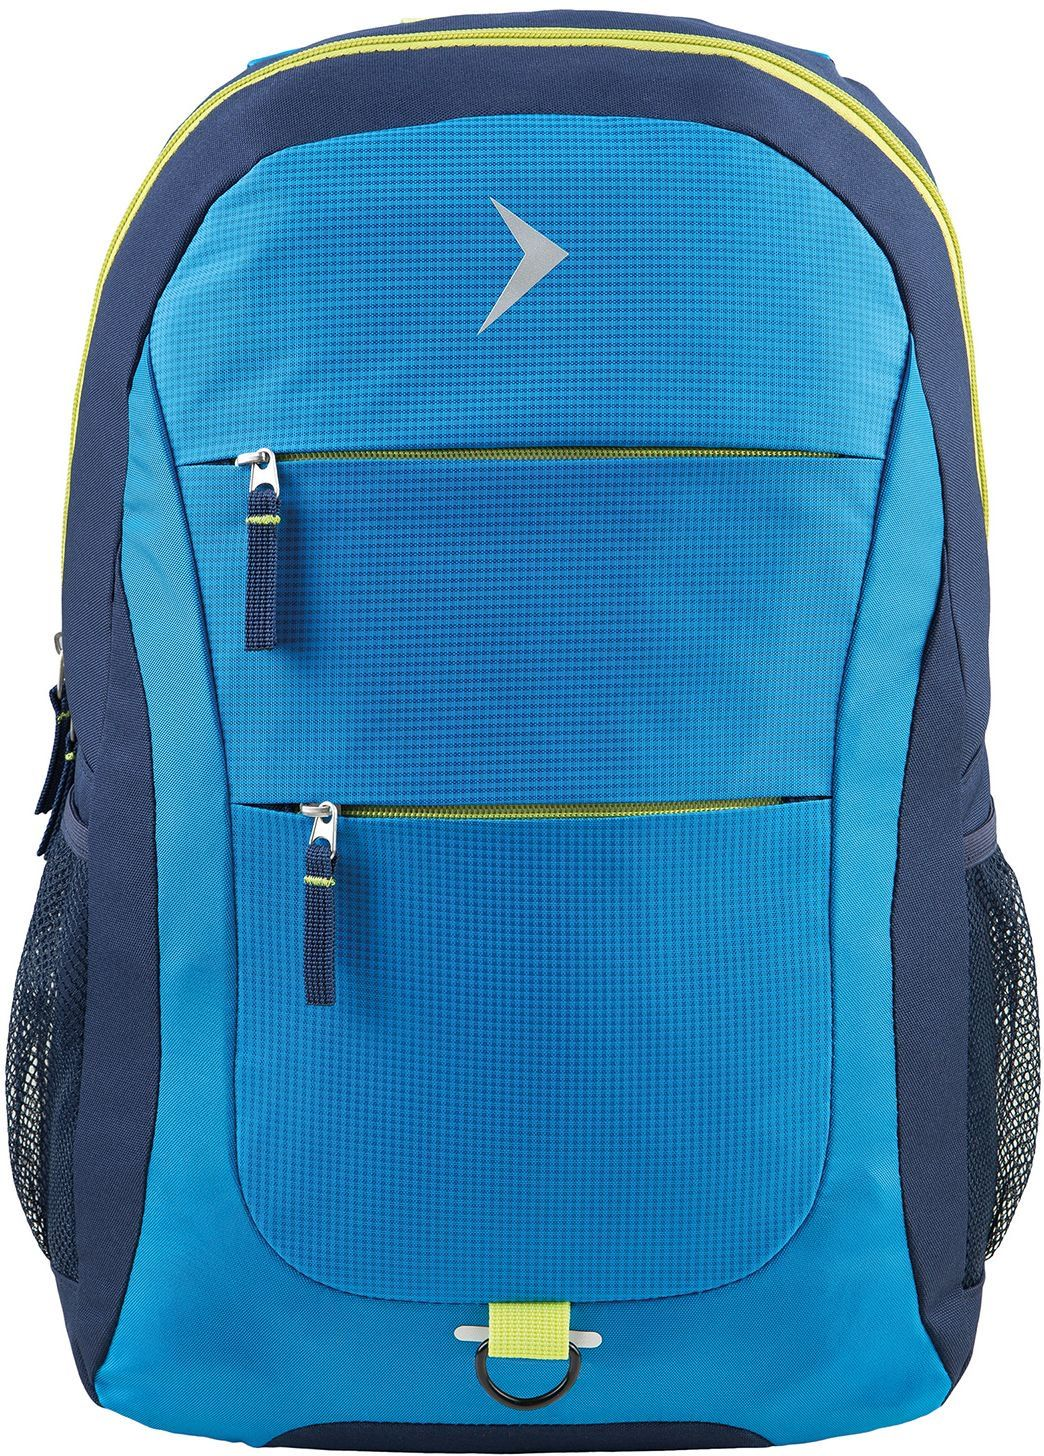 Outhorn Plecak HOL18-PCU613 22 niebieski